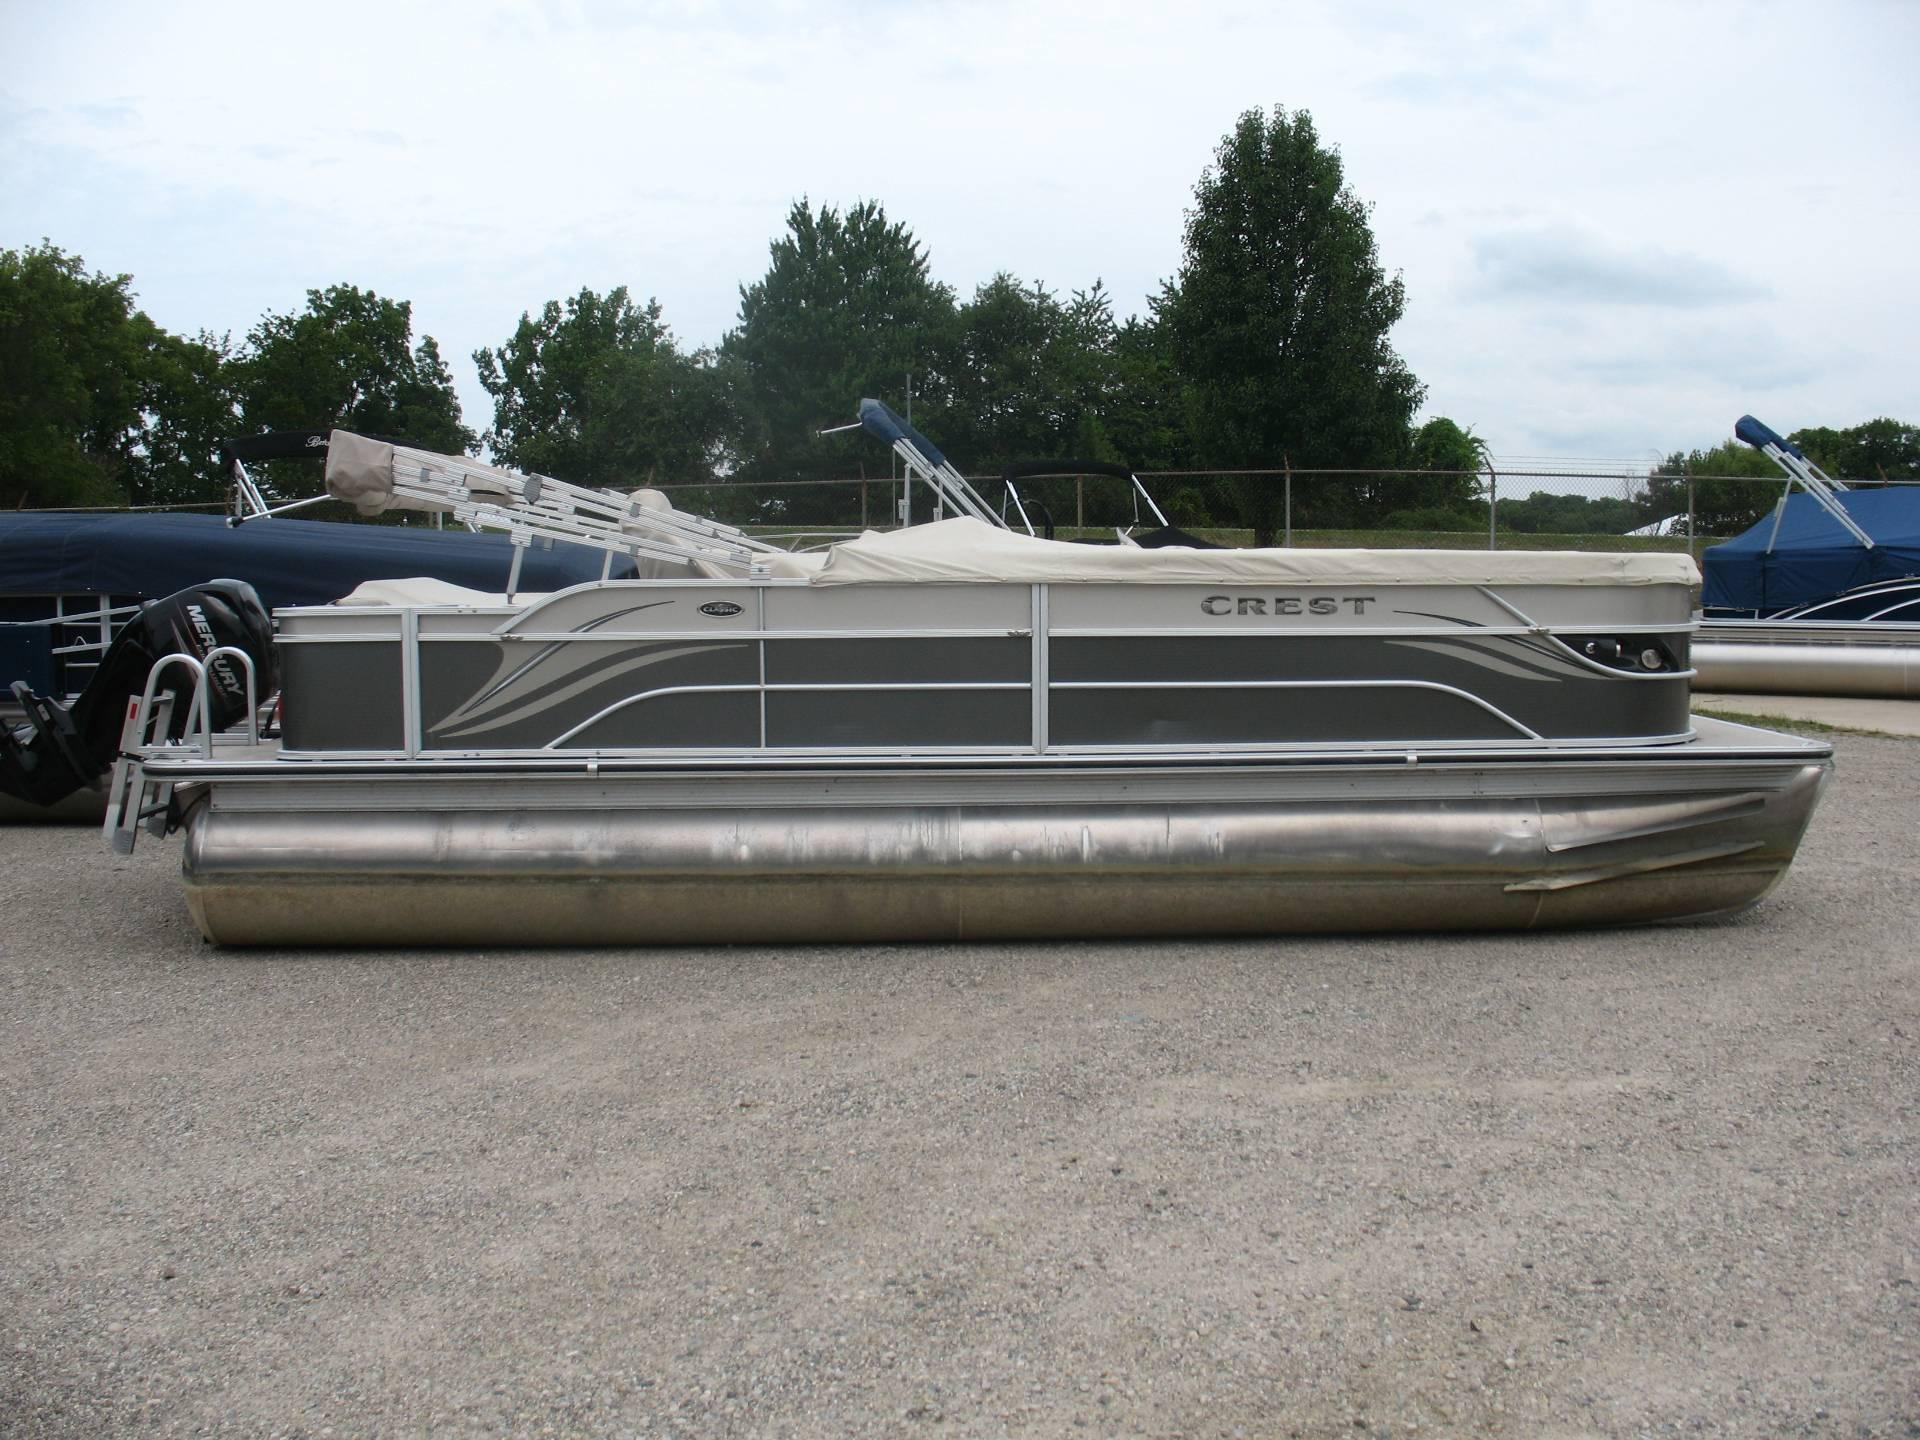 Used 2013 Crest Pontoon Boats Classic Slr Manitou Beach Mi 49253